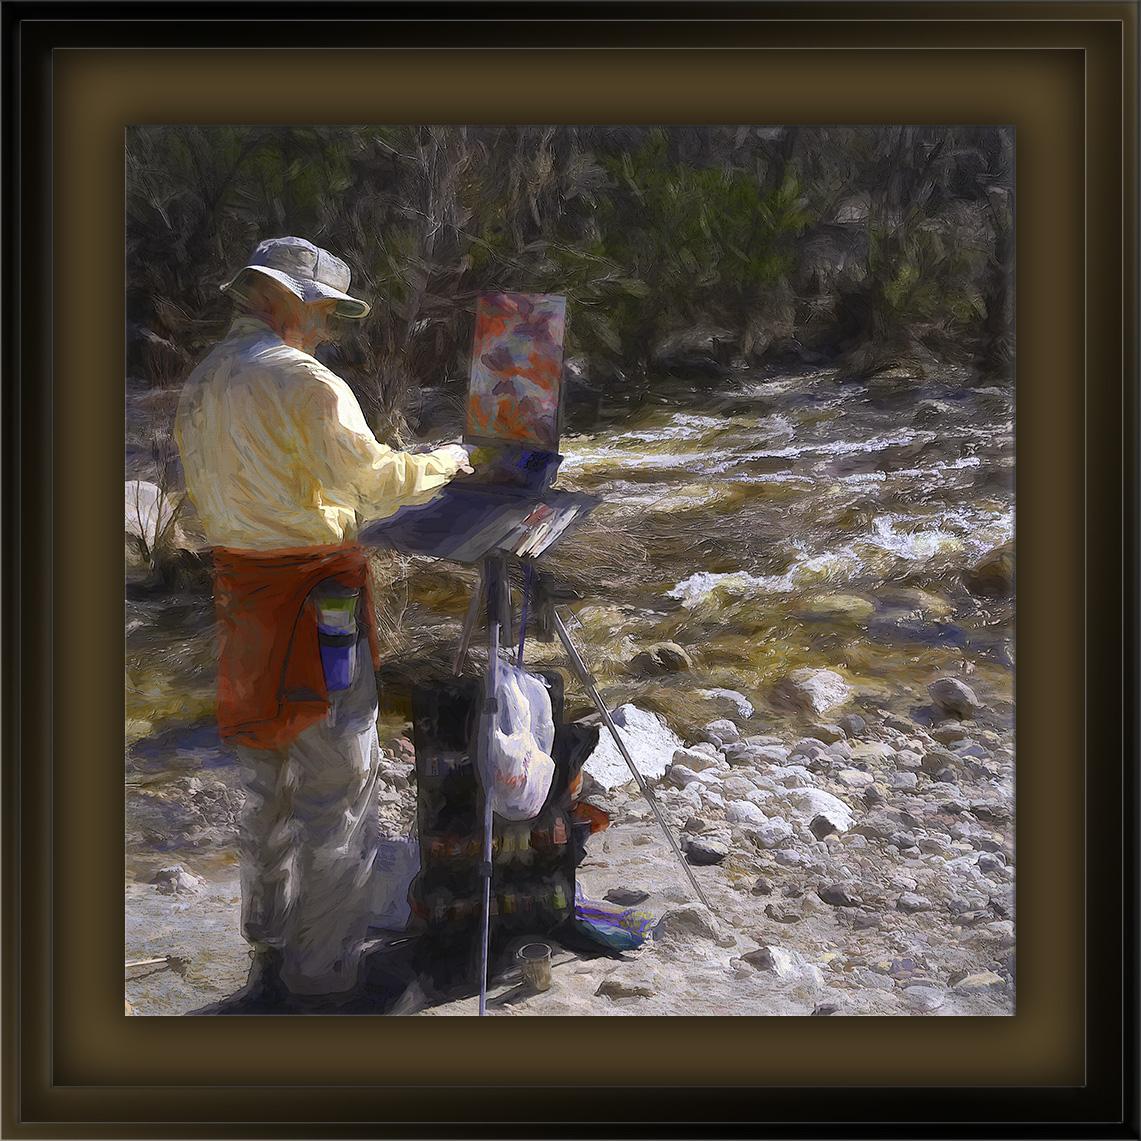 Ken Requard-2-Edit-2-art-72-2